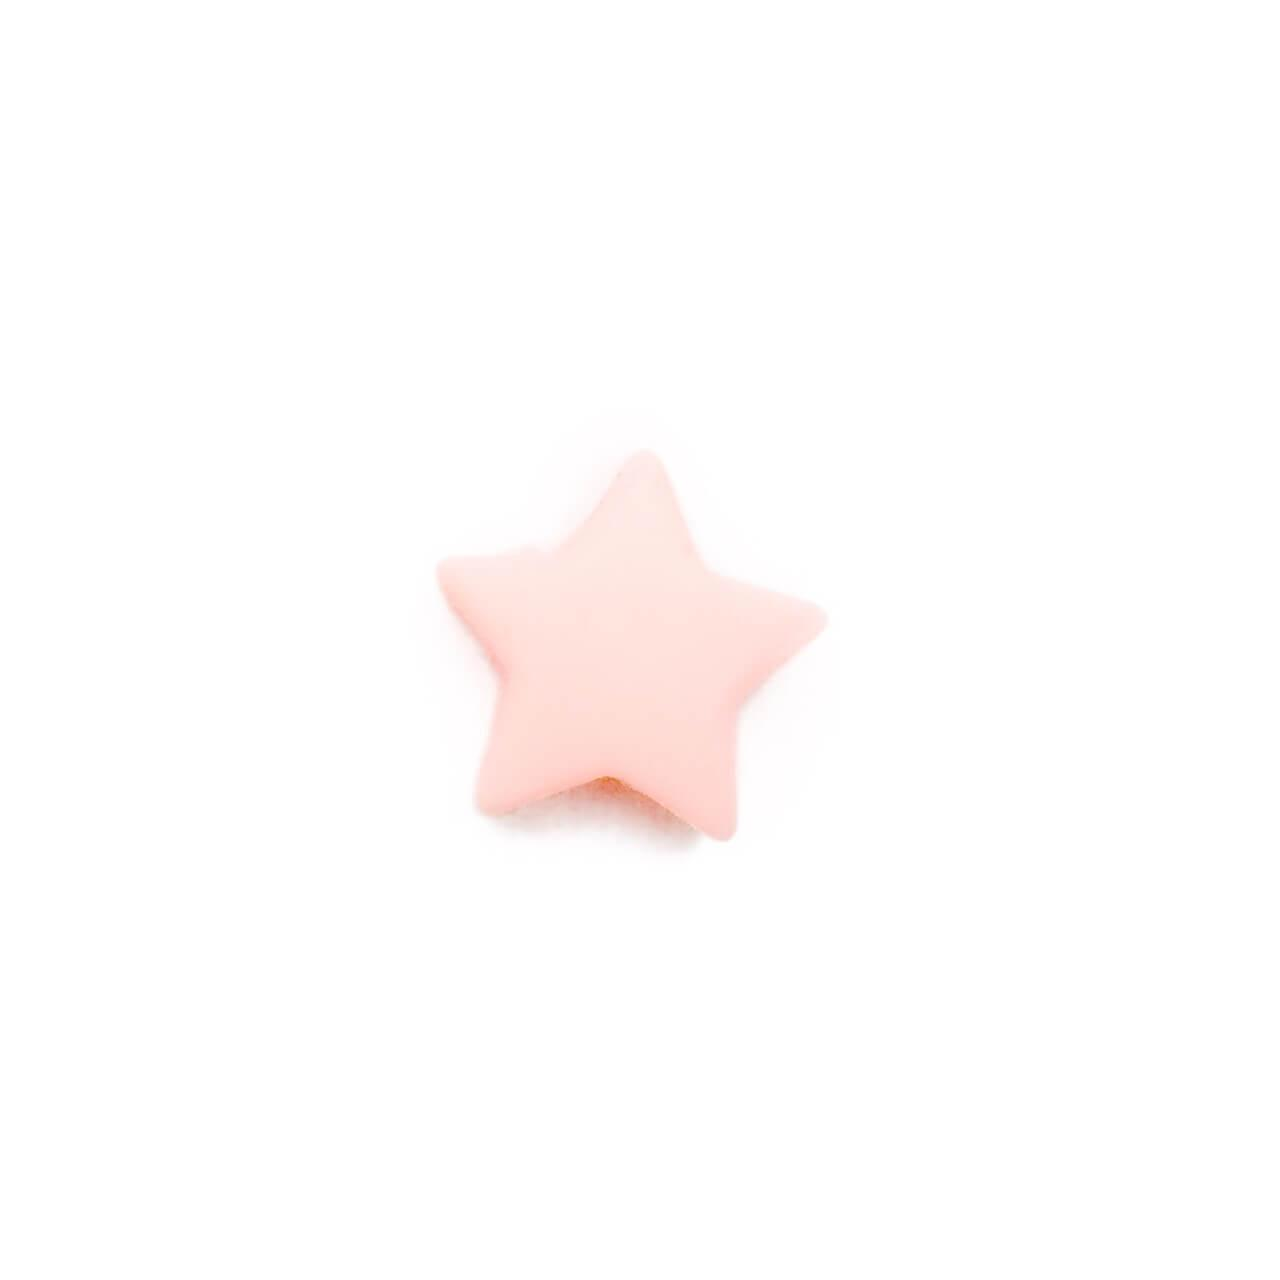 Мини звездочка (кварц) бусина из пищевого силикона